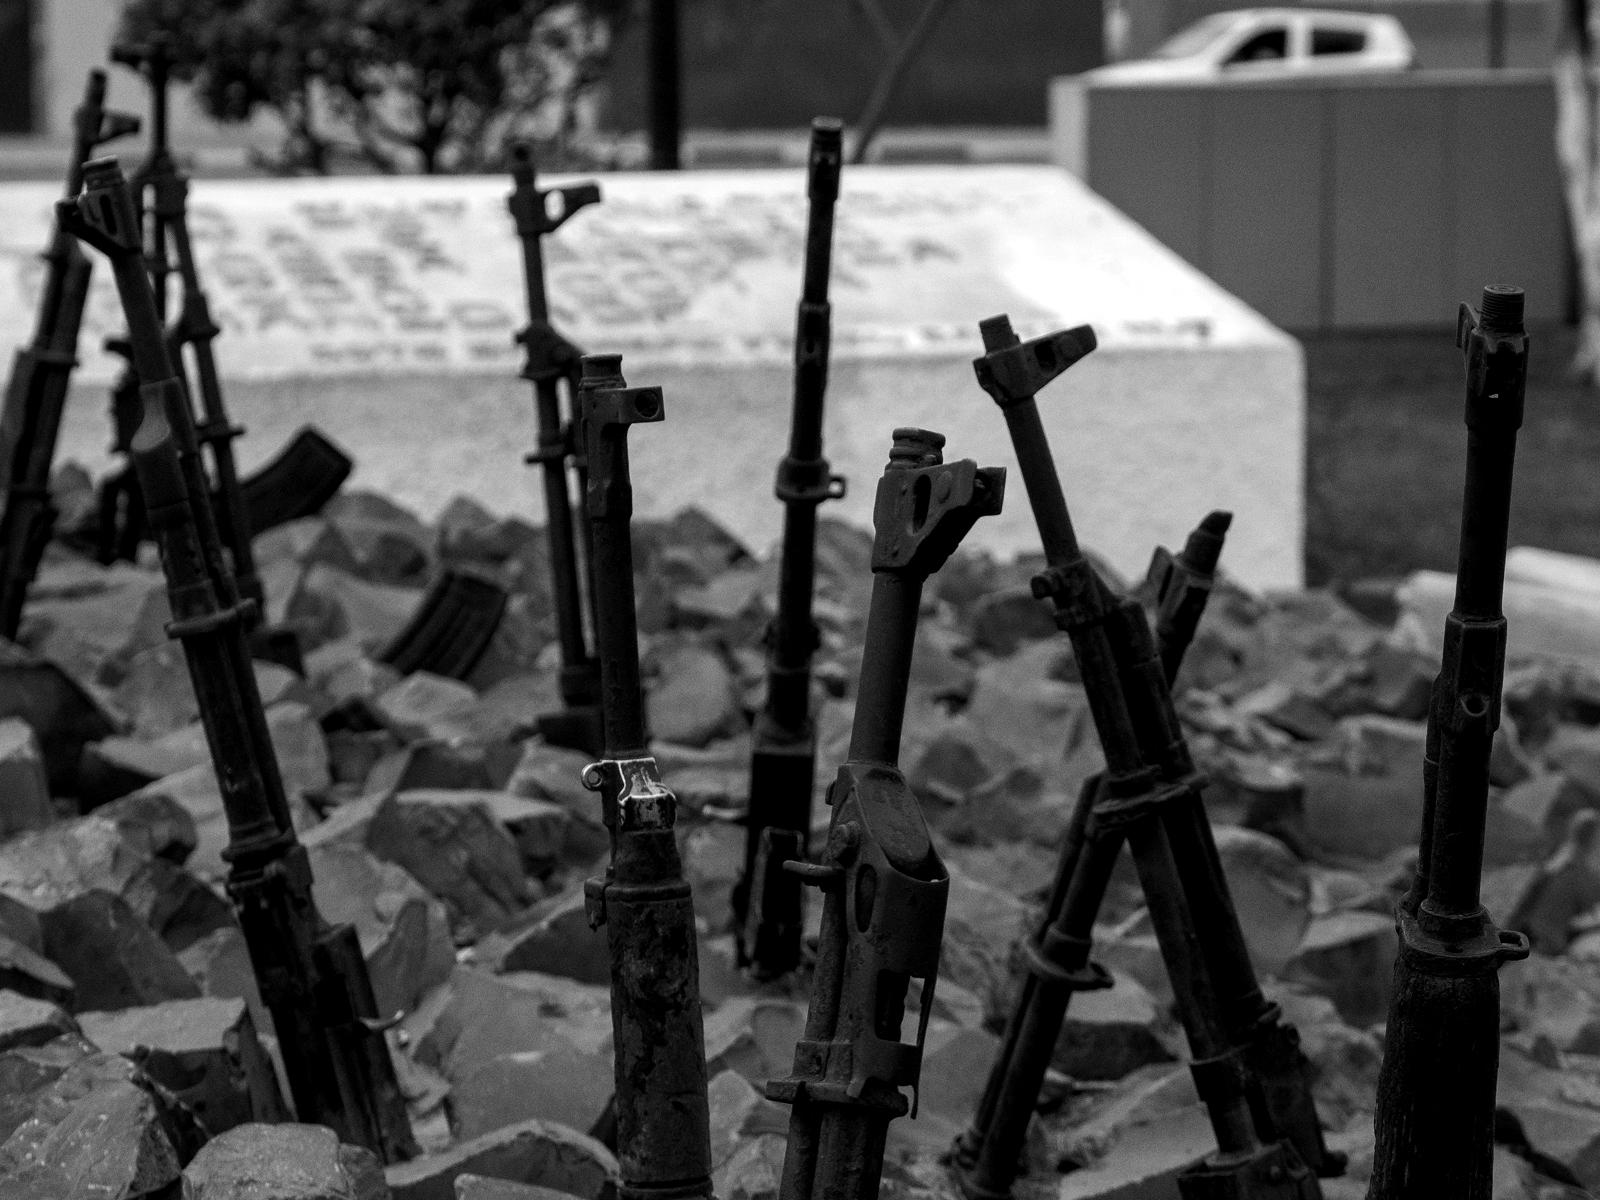 Guerra de Malanje: o dia mor